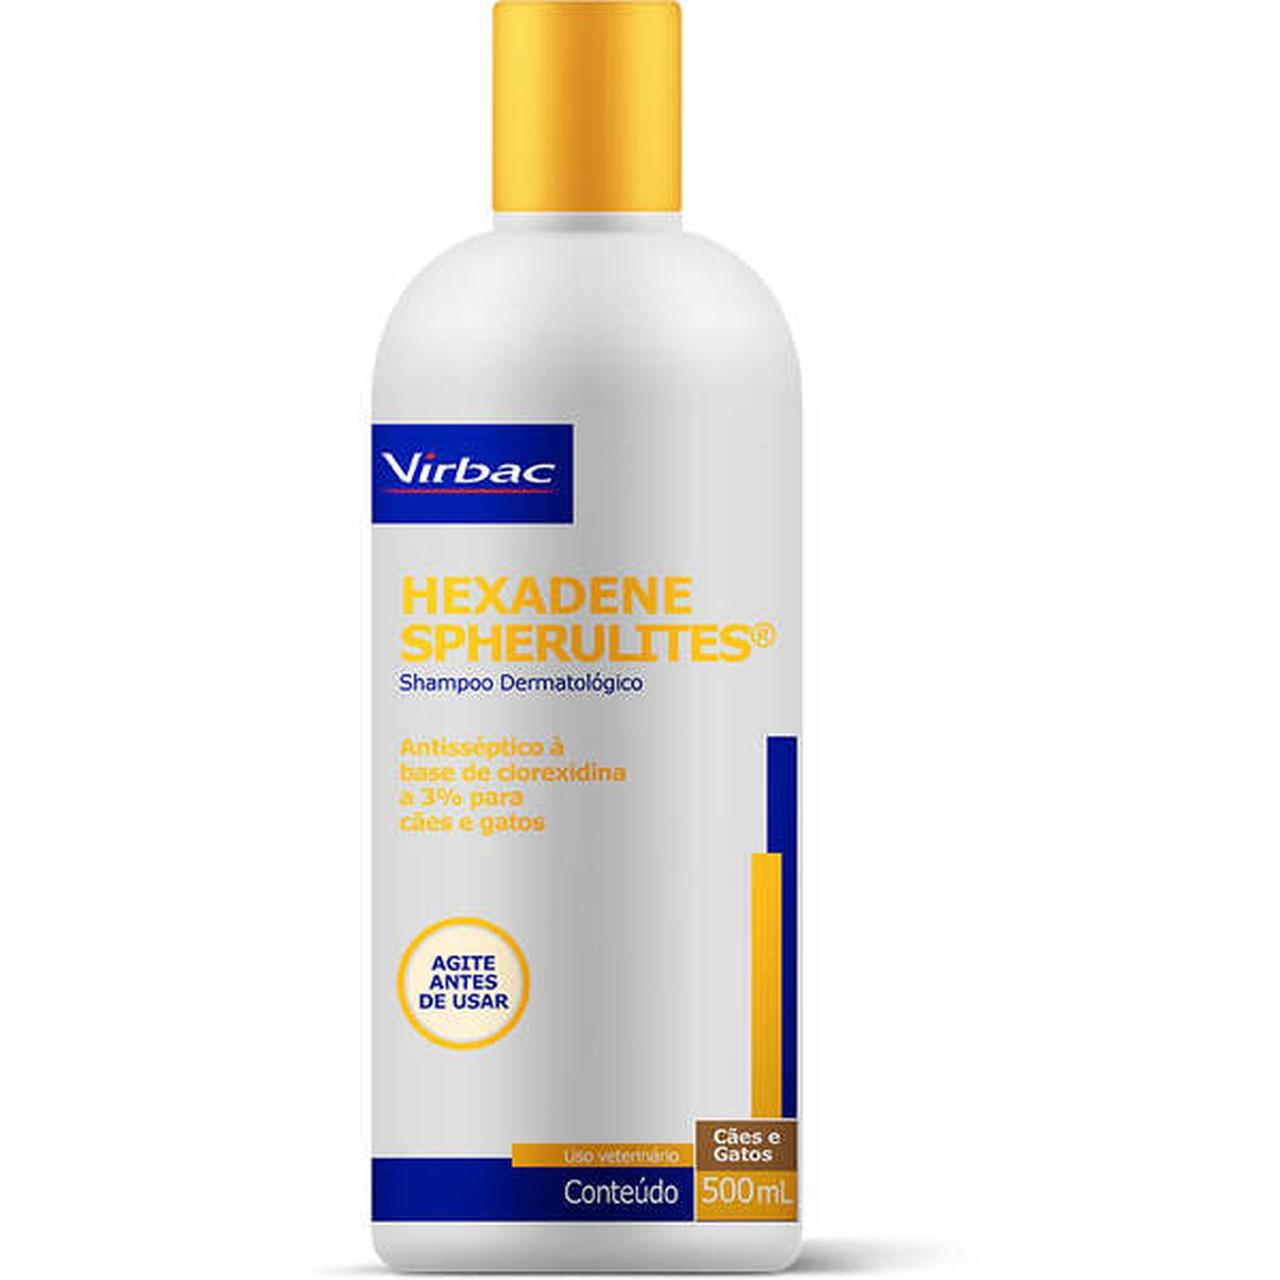 Shampoo Virbac Dermatológico  Hexadene Spherulites para Cães e Gatos